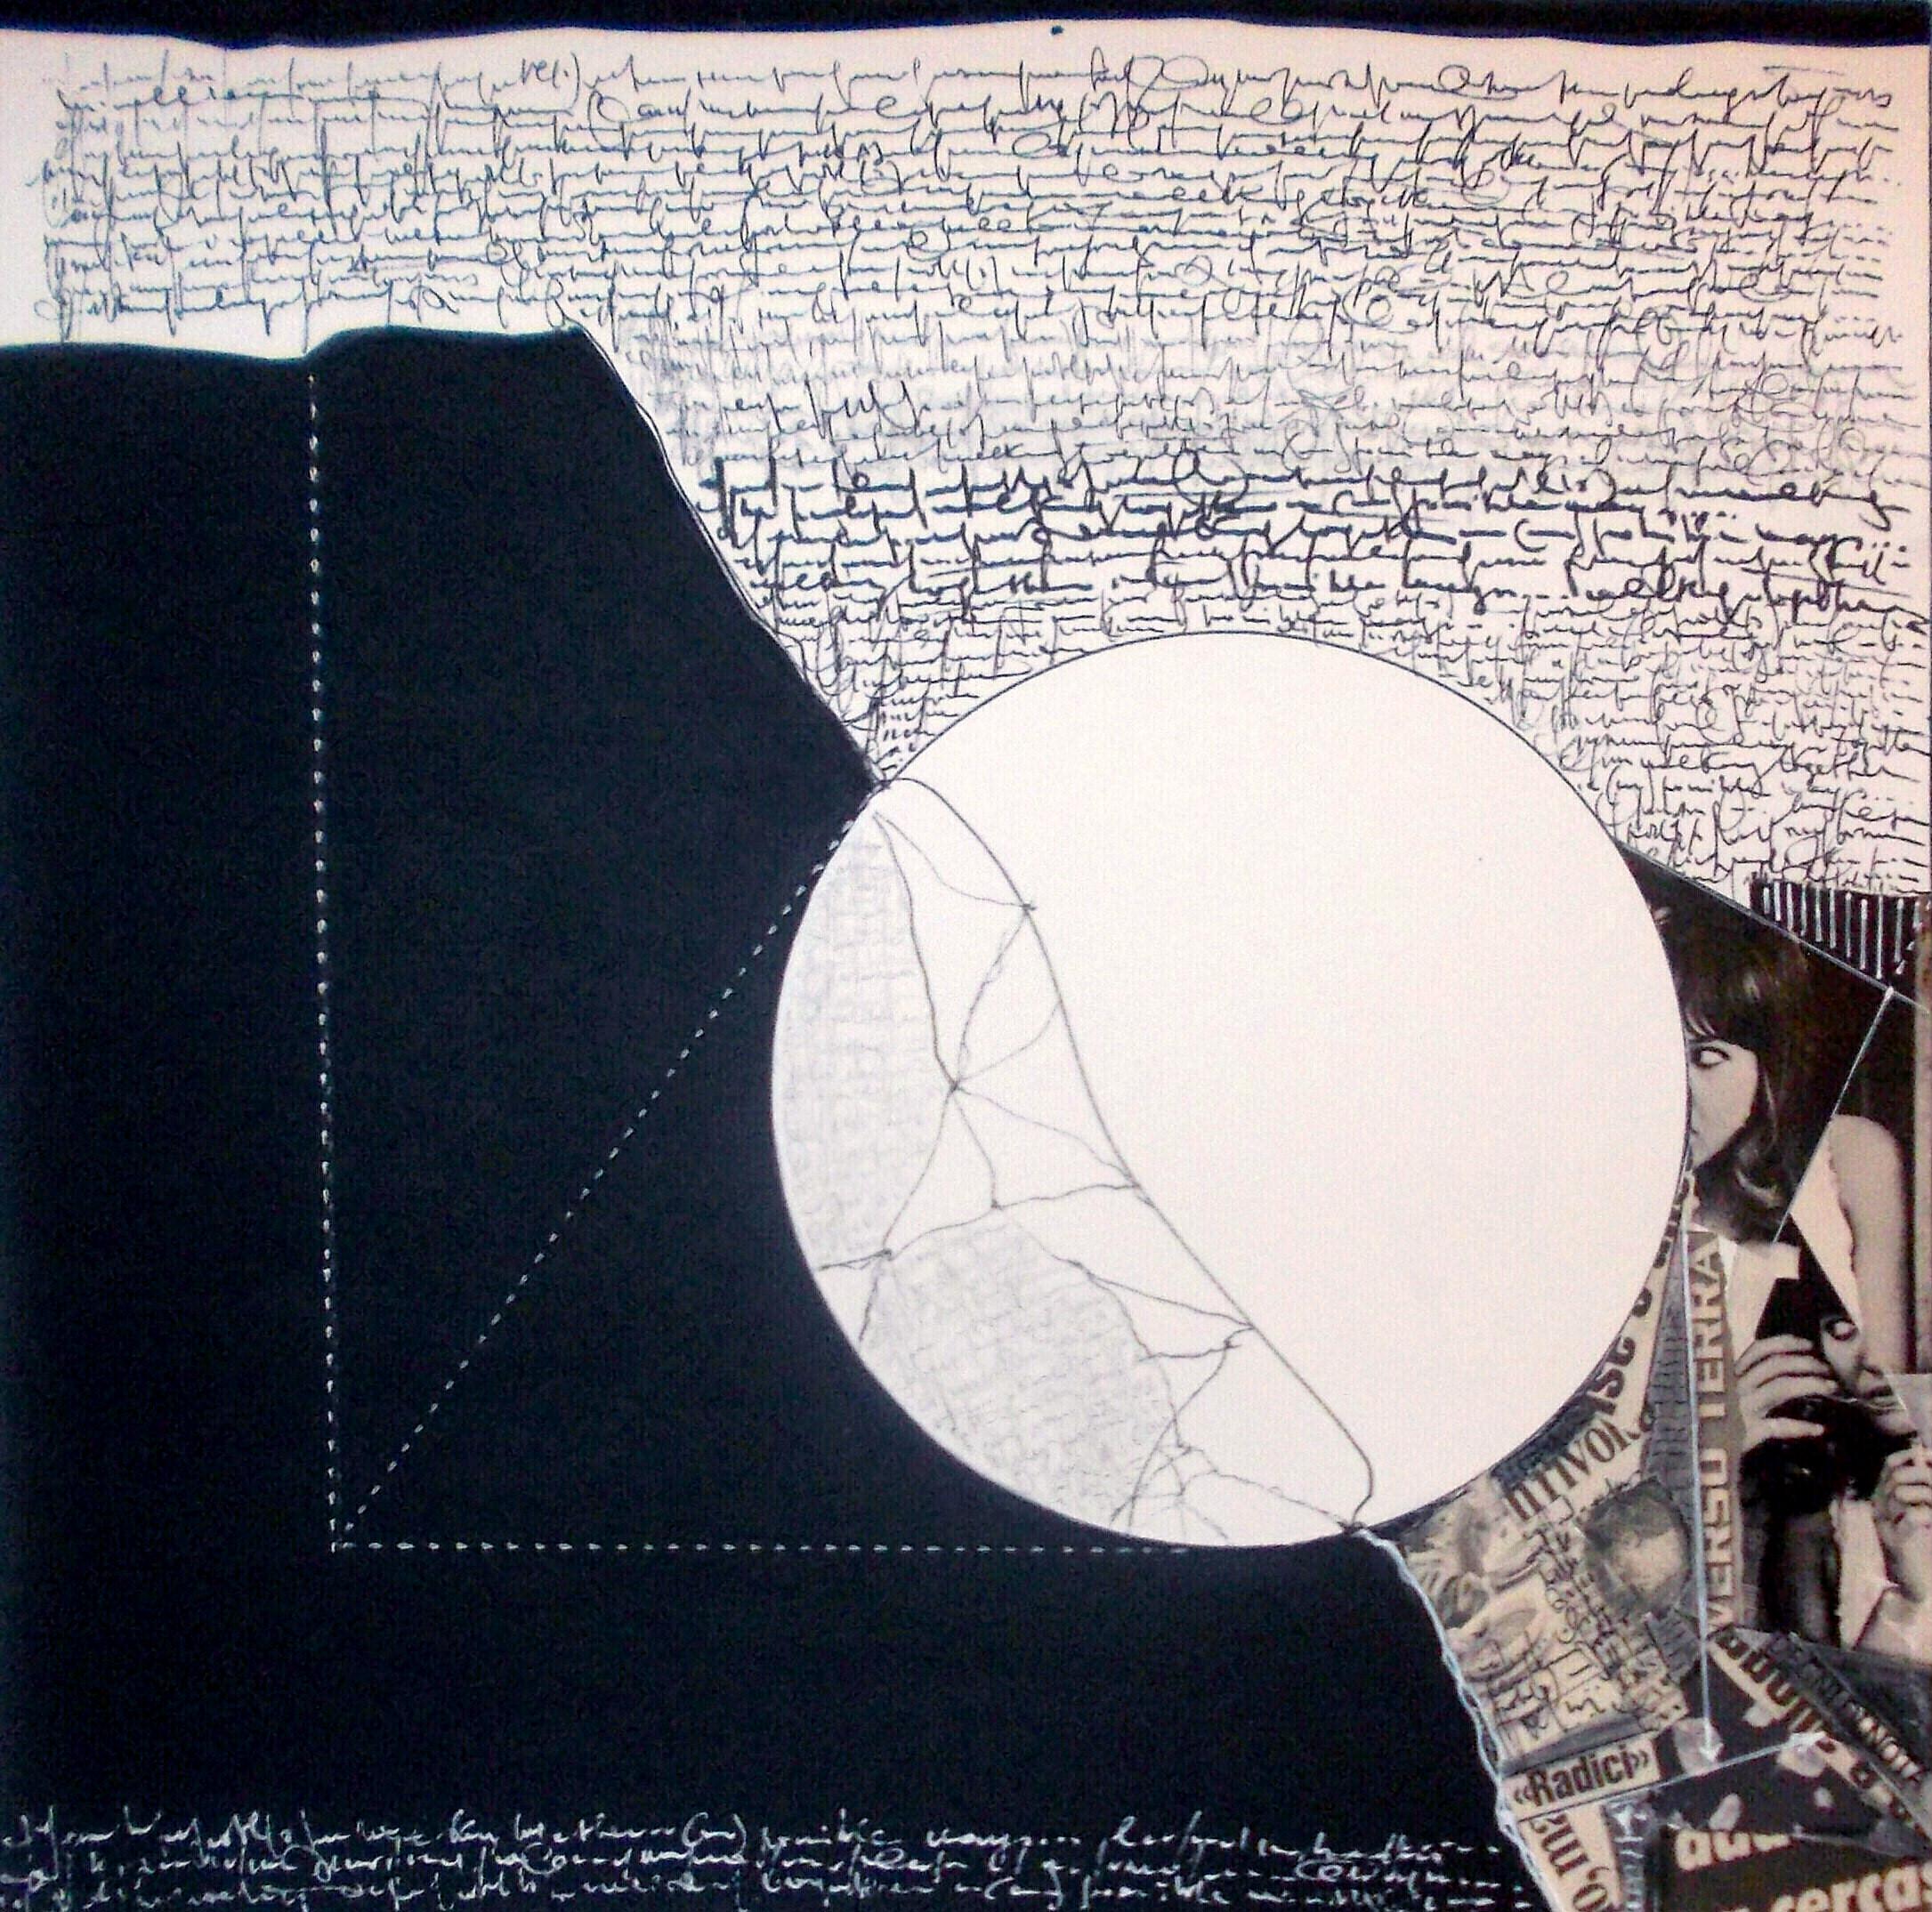 Lettera in ombra 1, 2014 - cm 50x50